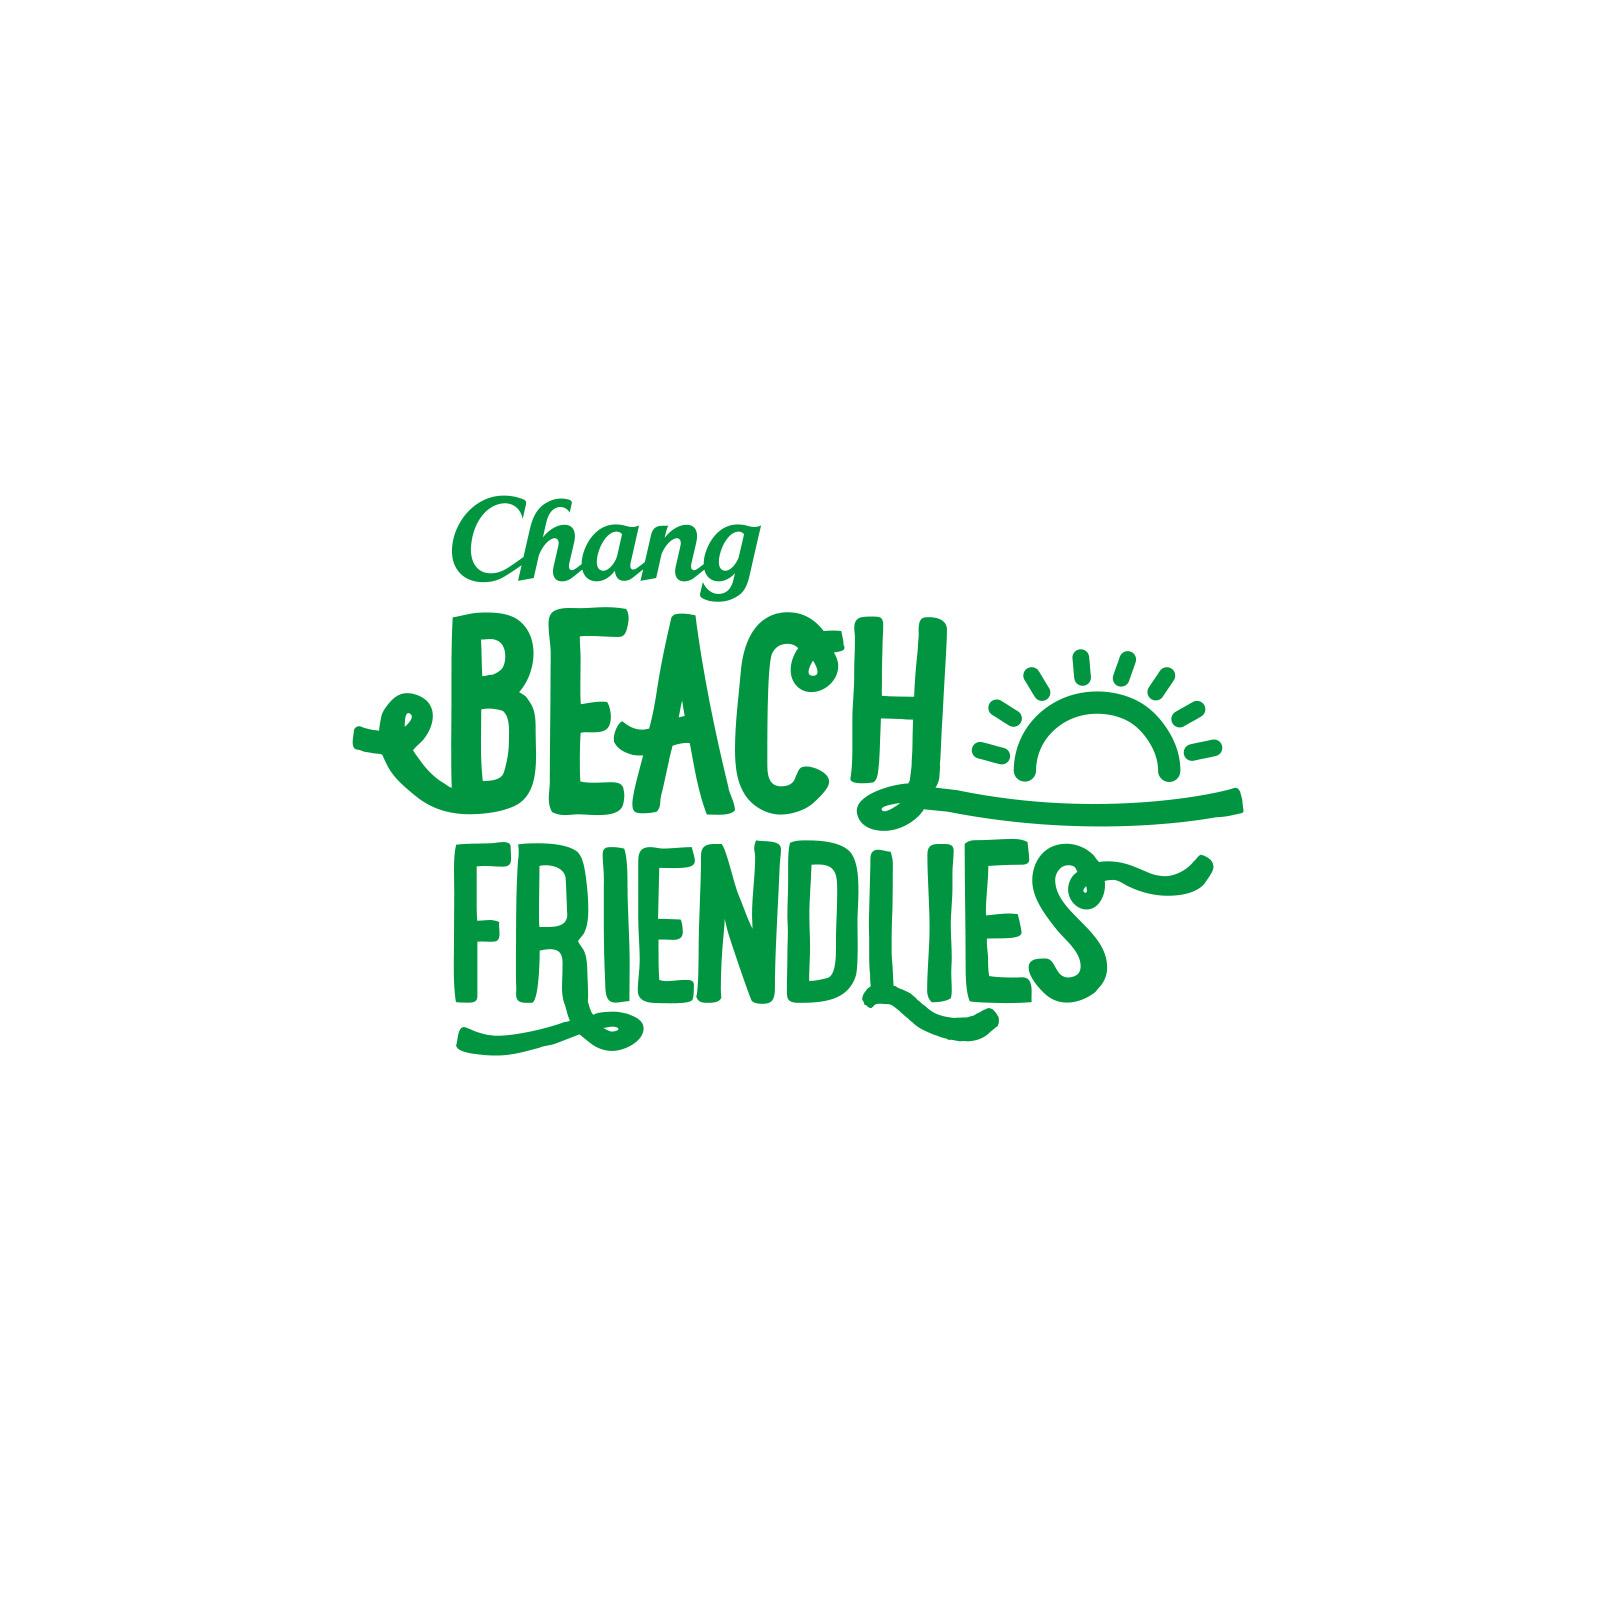 Friends Logos3.jpg